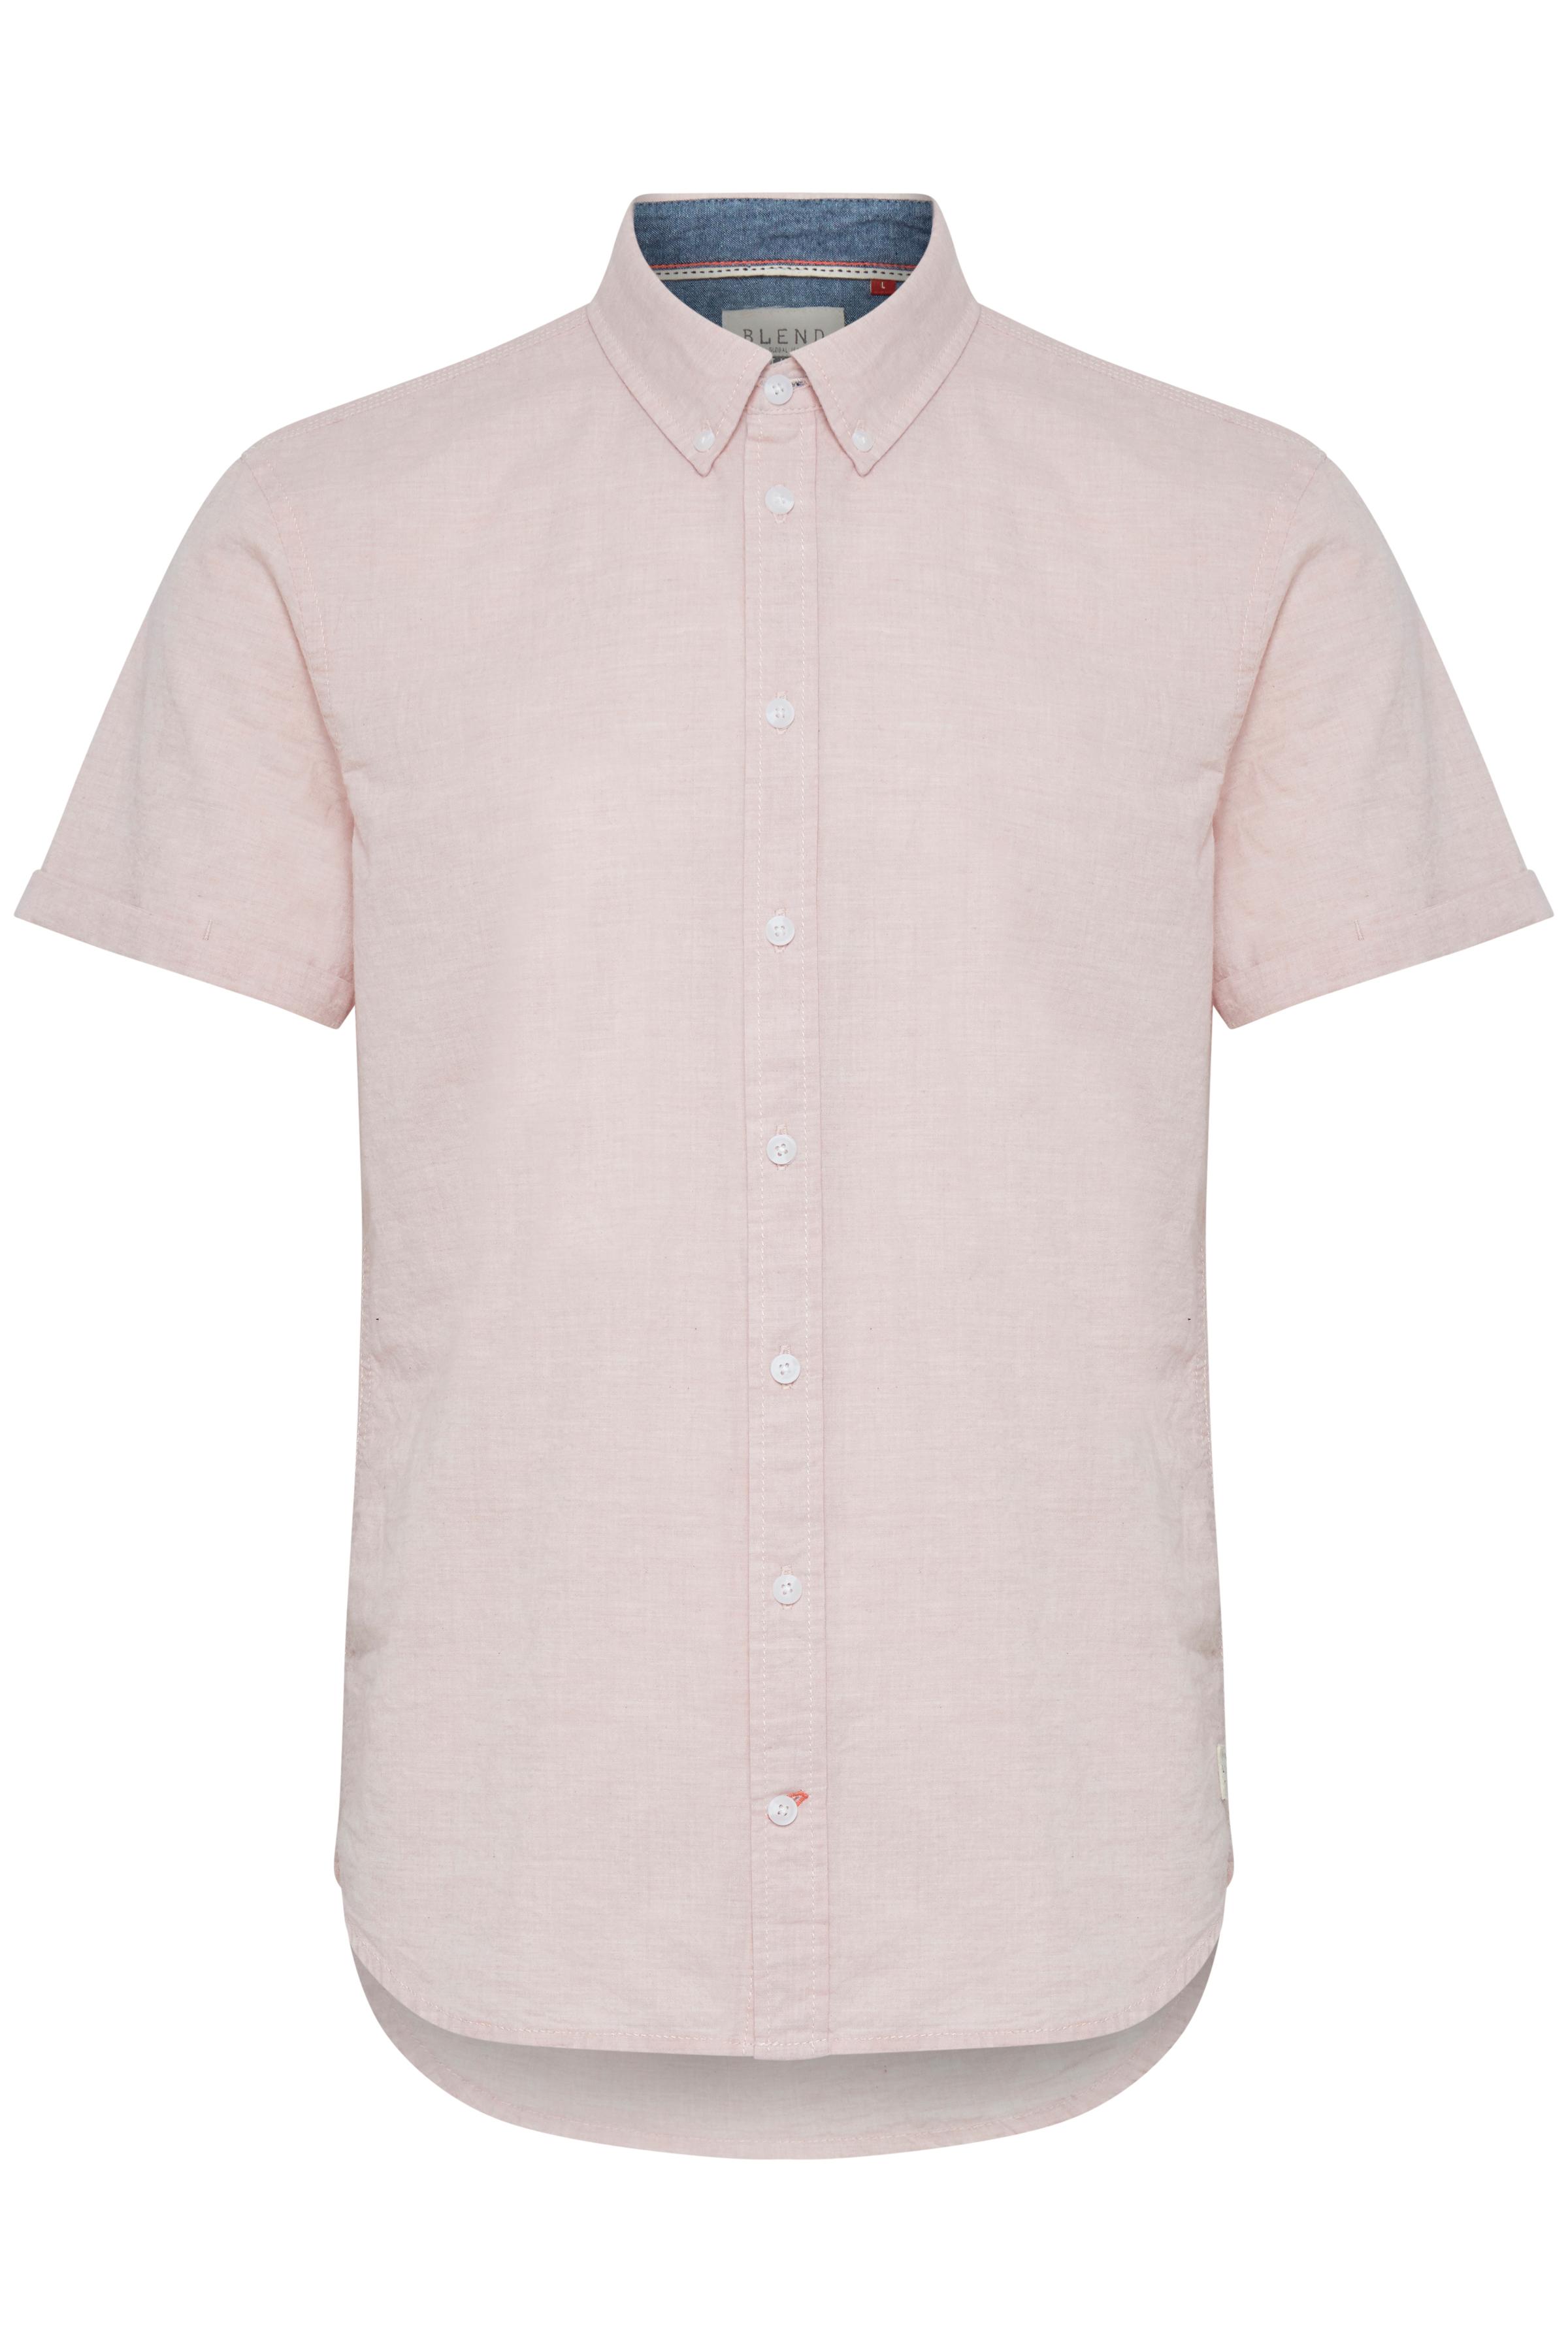 Pale Blush Pink